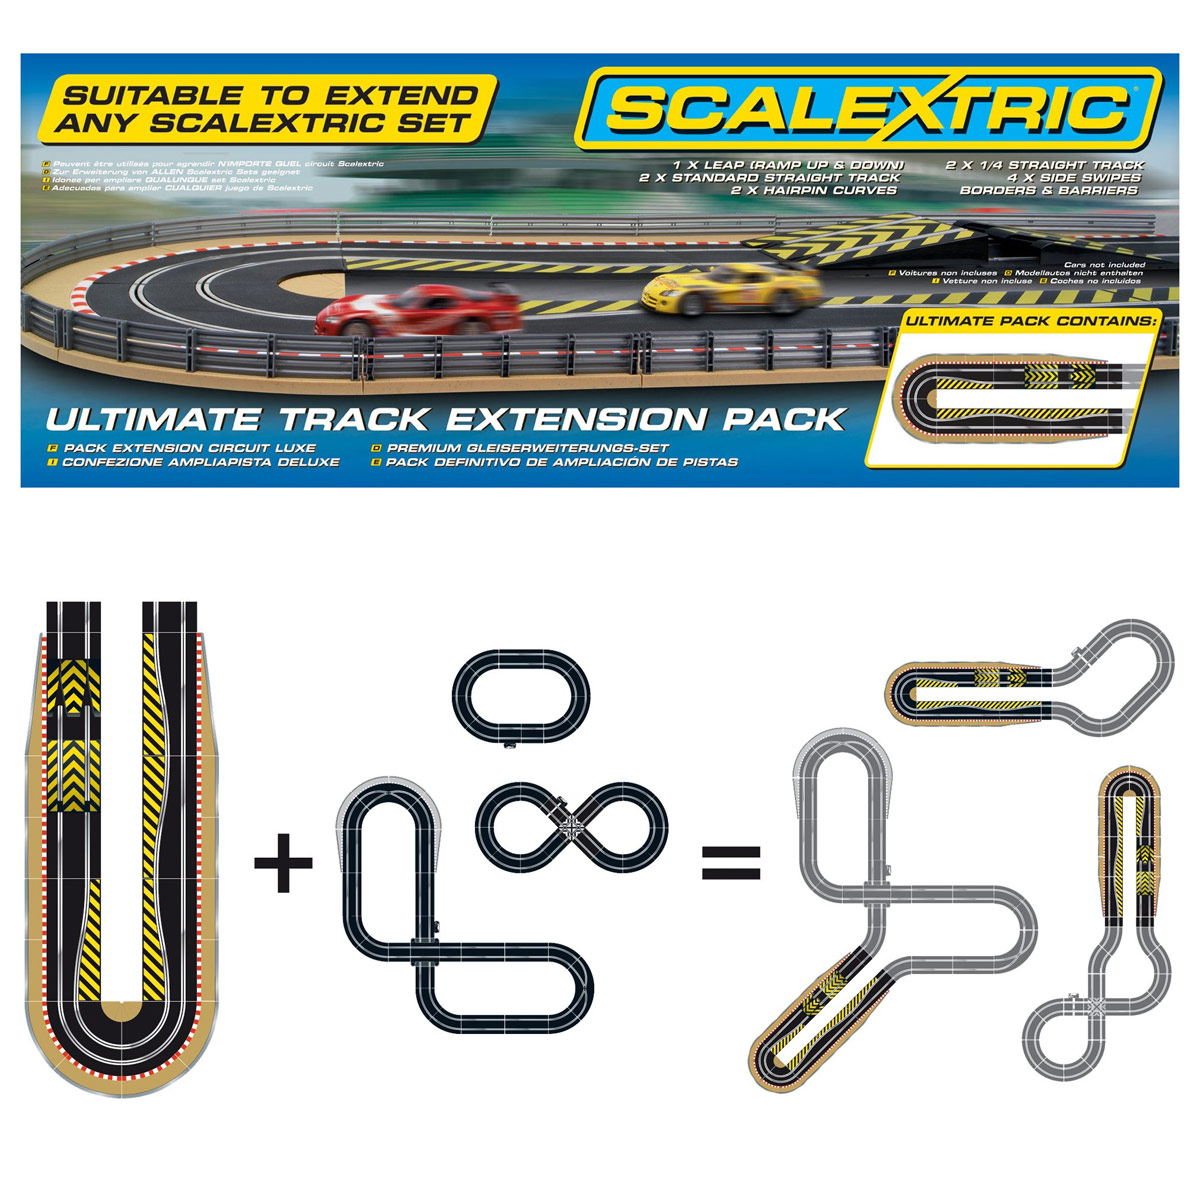 Slot Car Supplies Uk Casino Portal Online Track Wiring Ho Racing Power